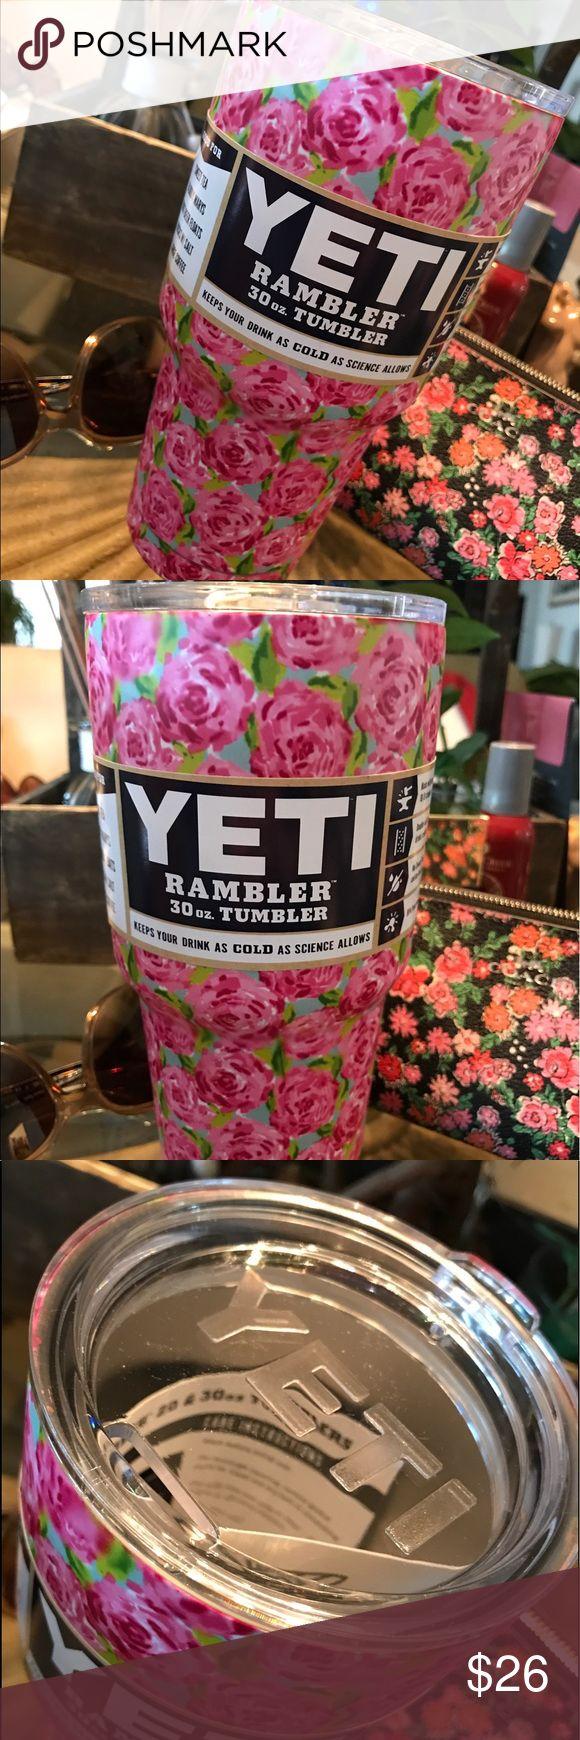 Lilly Pulitzer Rose Yeti Rambler Tumbler 30 Ounce Lilly Pulitzer Rose Yeti Rambler Tumbler 30 Ounce New Unused Authentic Yeti Rambler and Lid. Yeti Accessories